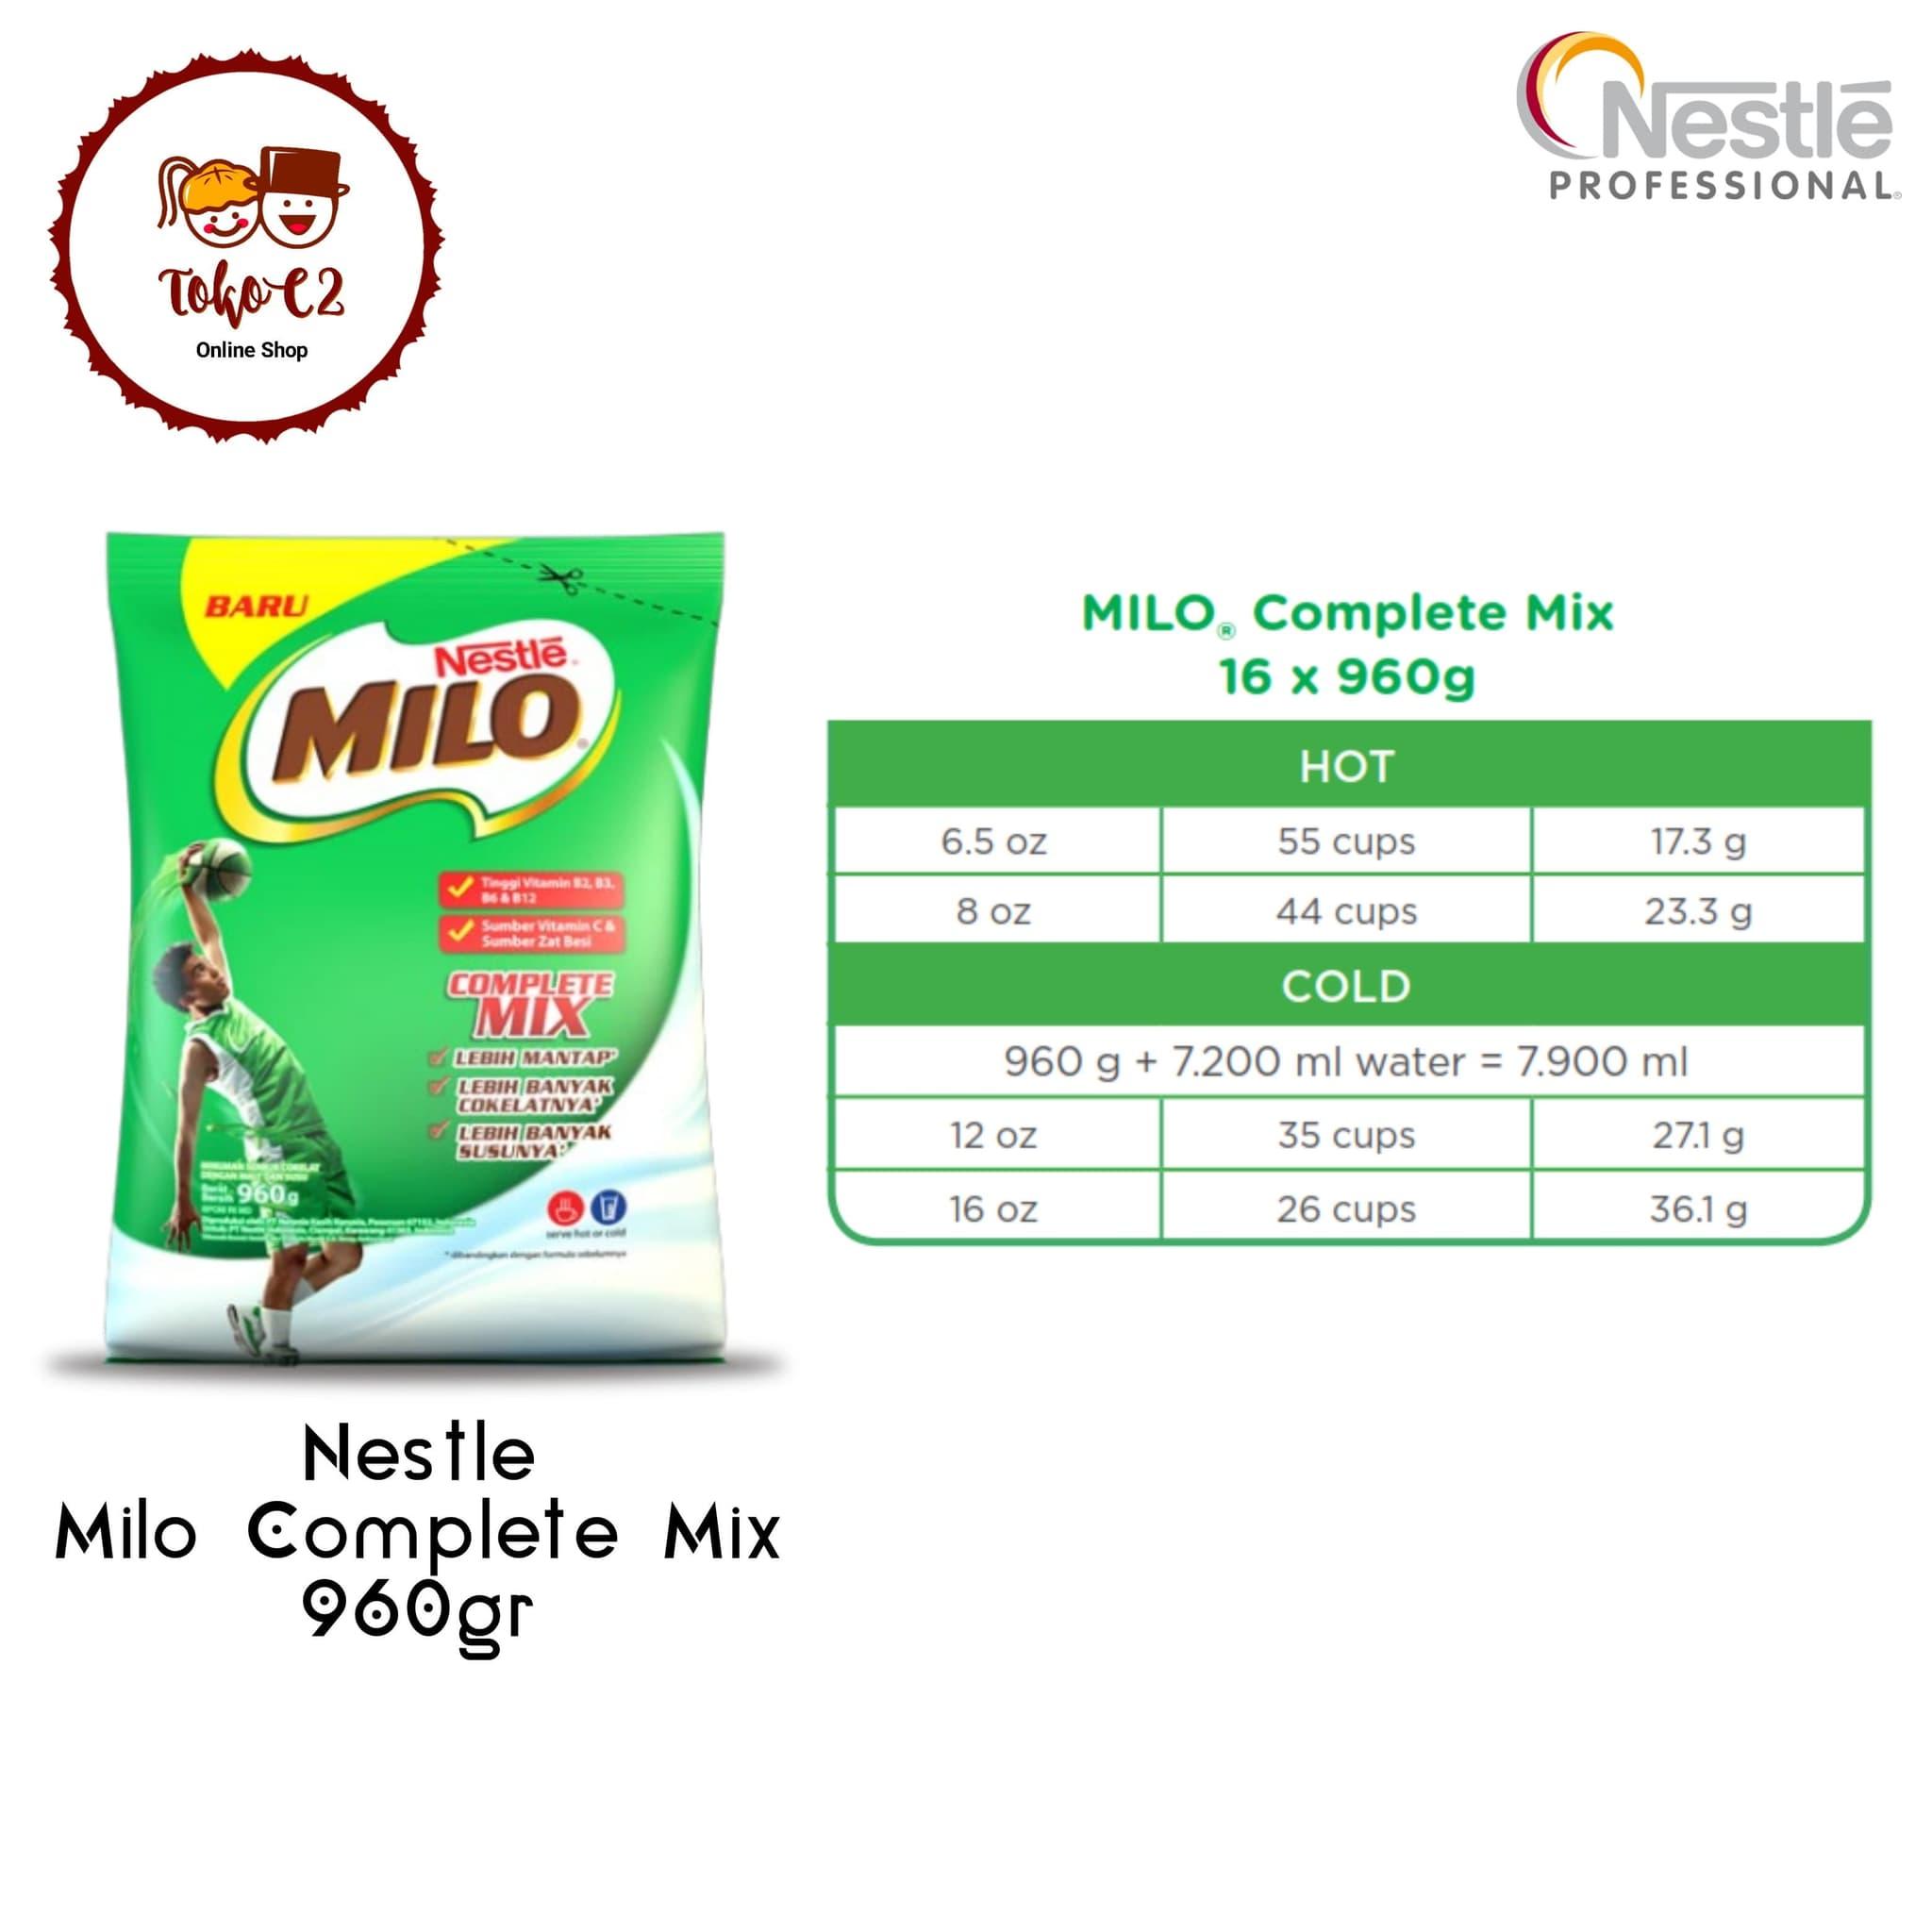 Nestle Milo Professional Complete Mix 960gr Daftar Harga Terbaru Nescafe Classic 120gram By Kualitas Hotel Resto Ampamp Cafe Jual Hot